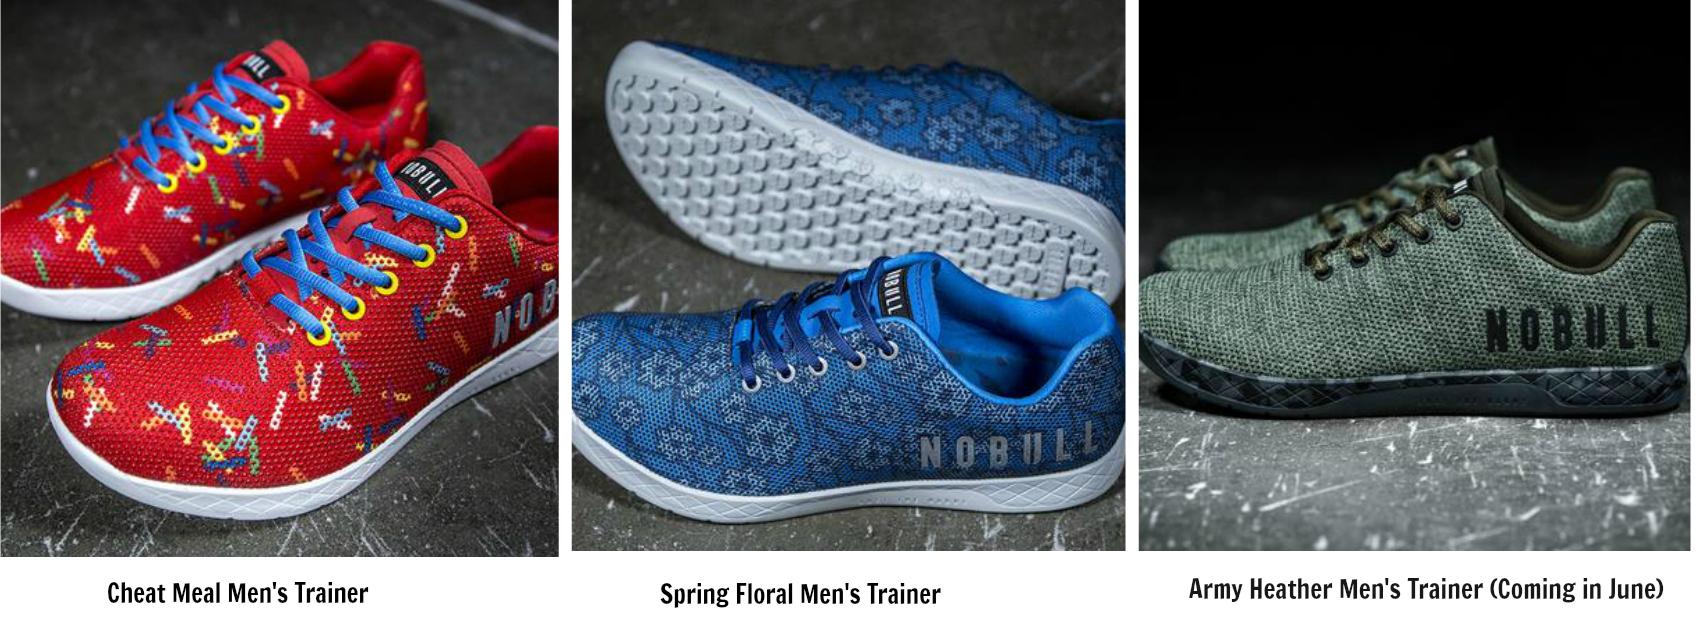 nike light blue womens trainers like nobull shoes